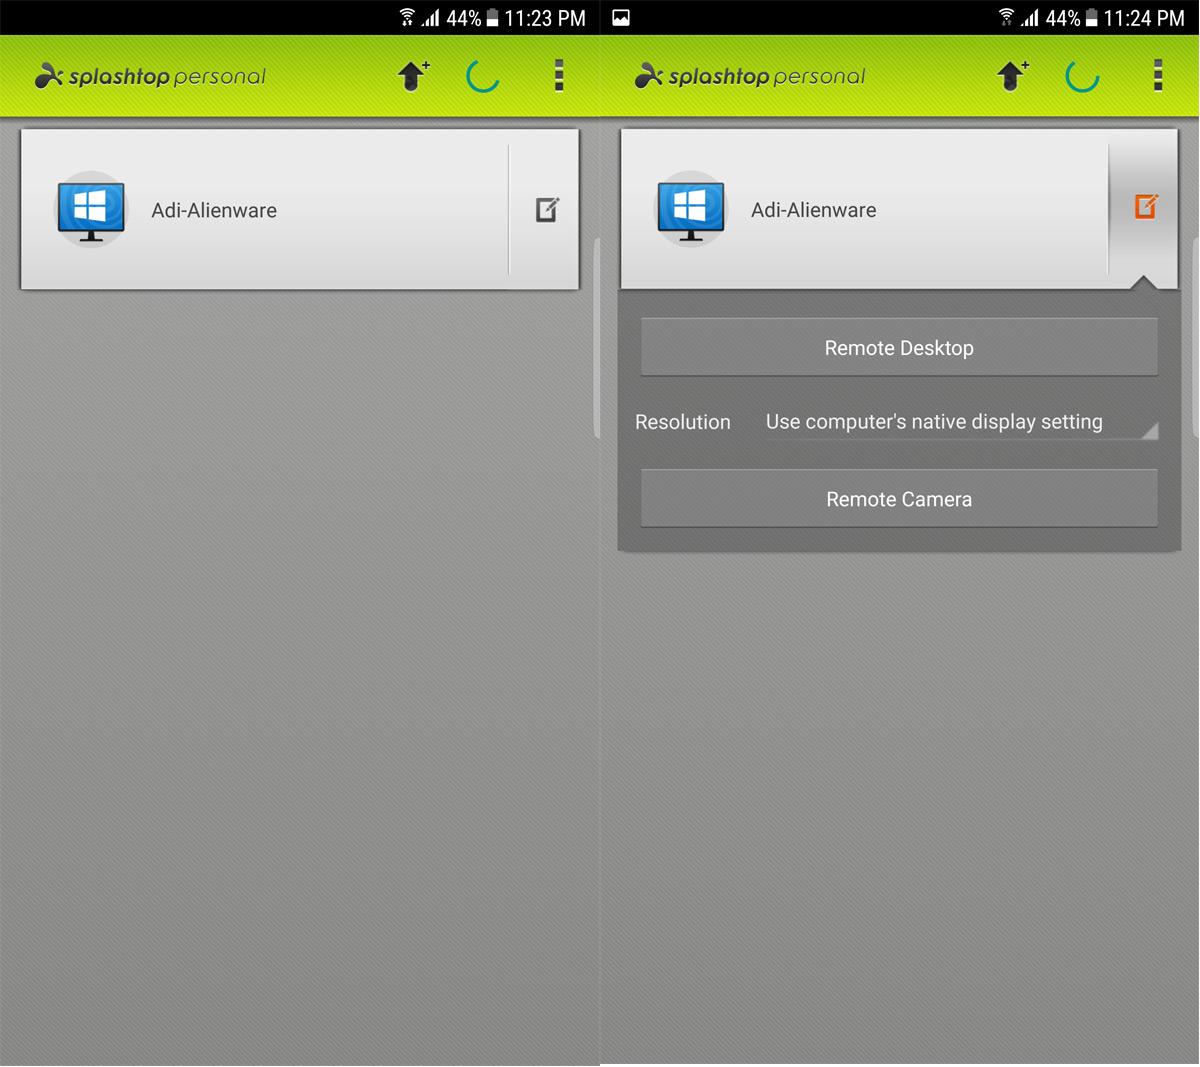 Splashtop Android App Window